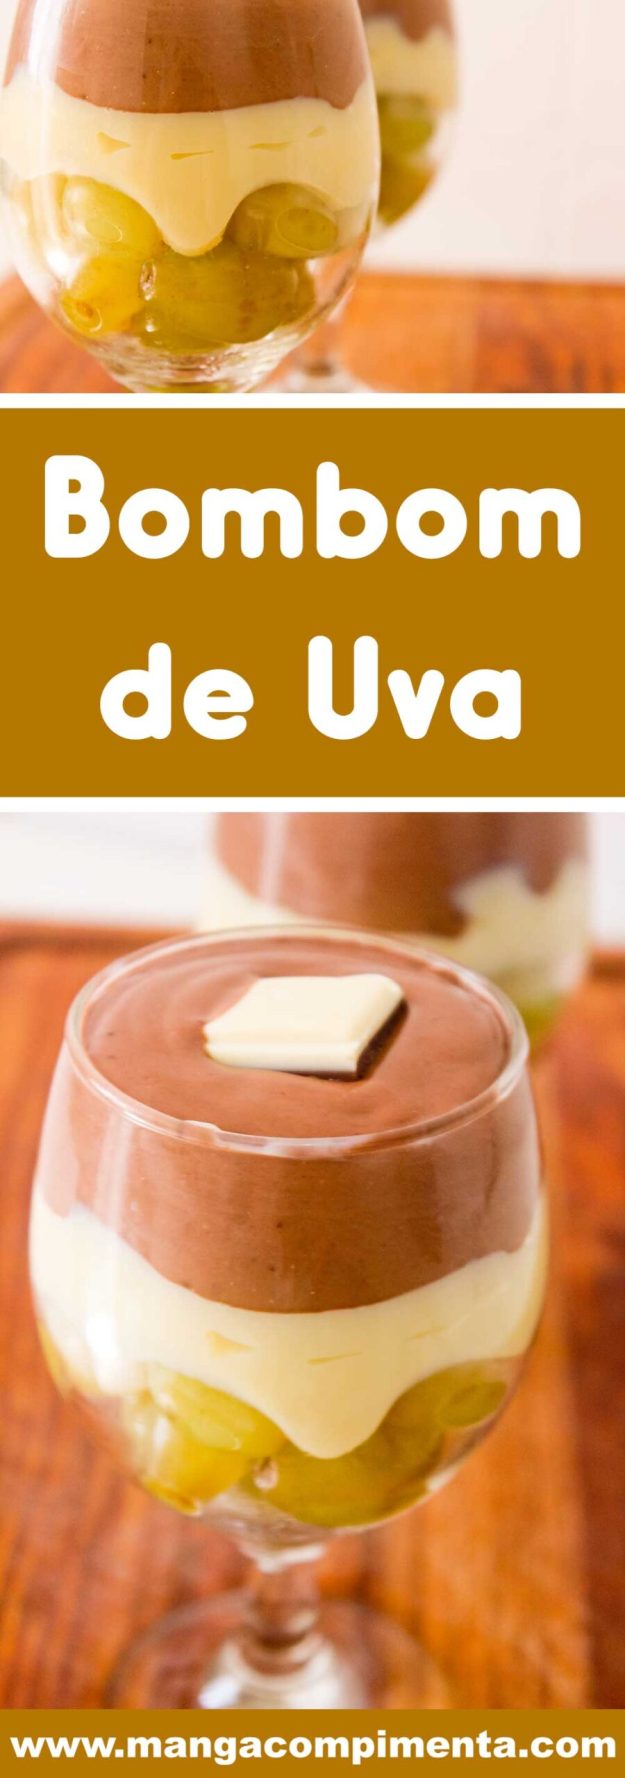 Receita de Bombom de Uva - prepare essa sobremesa deliciosa para as festas de final de ano!